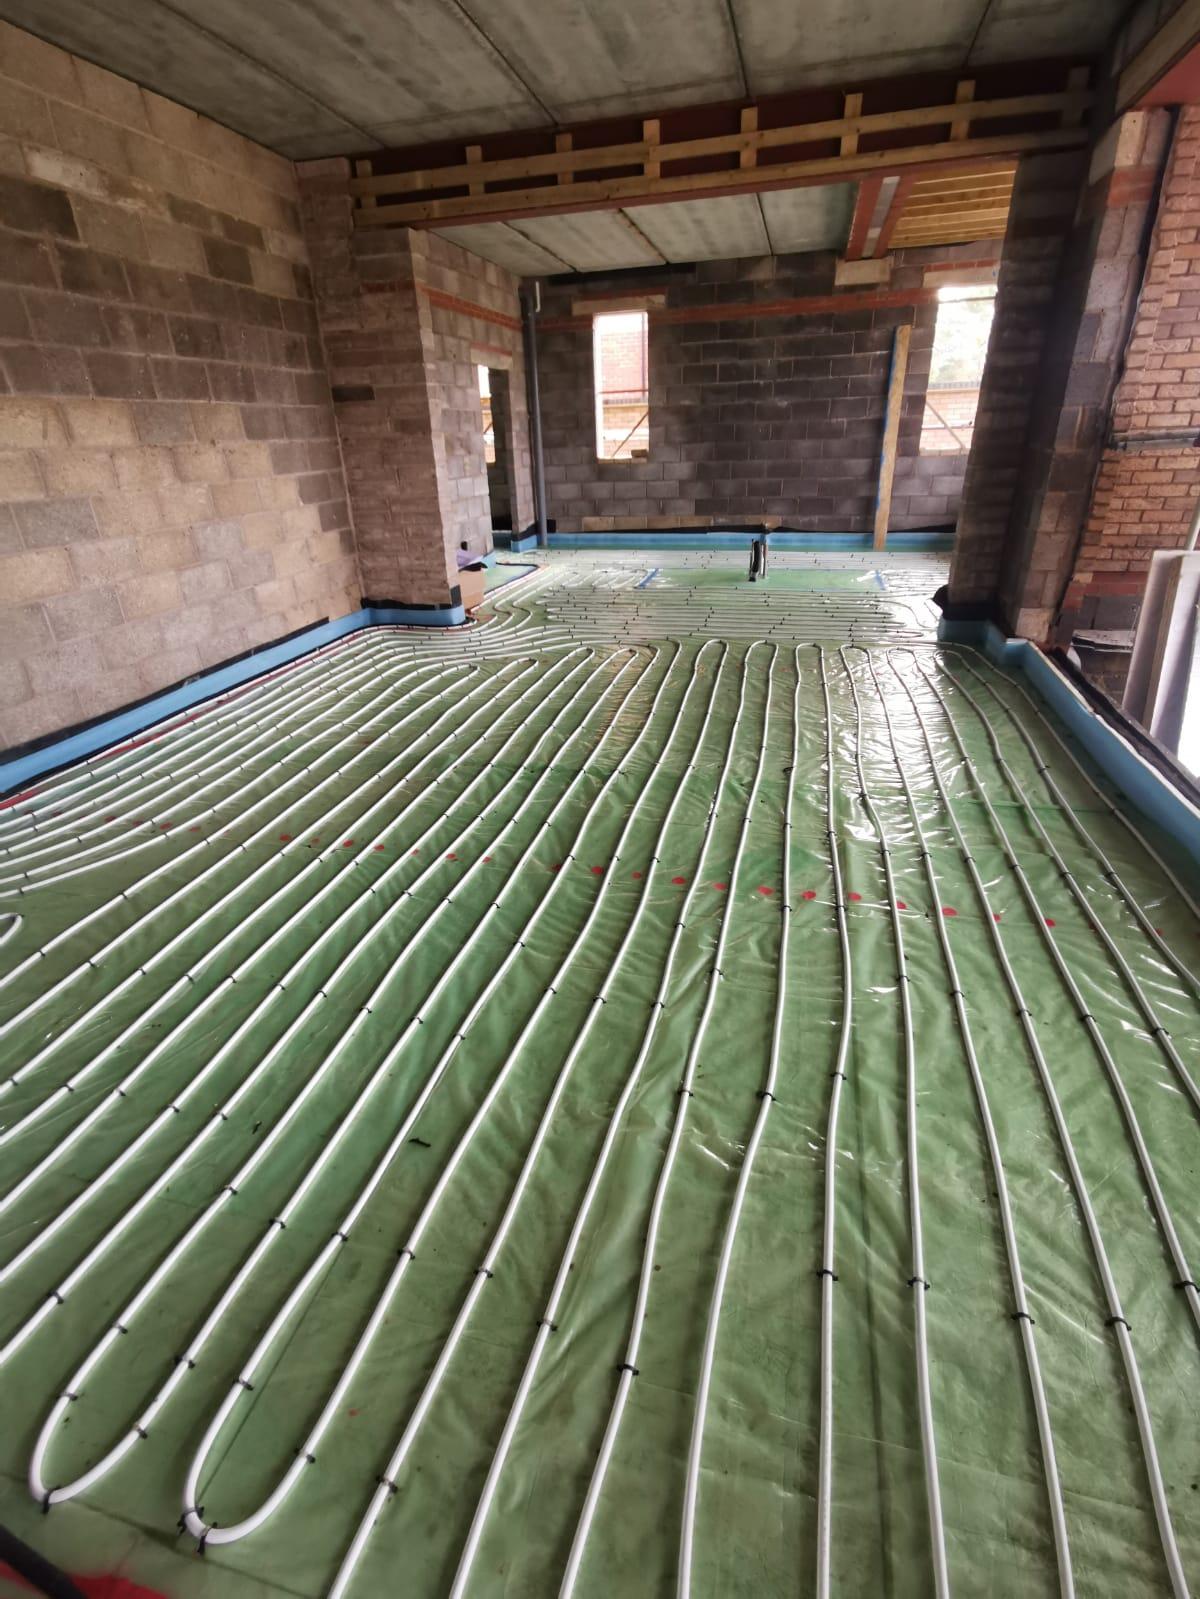 Underfloor Heating image